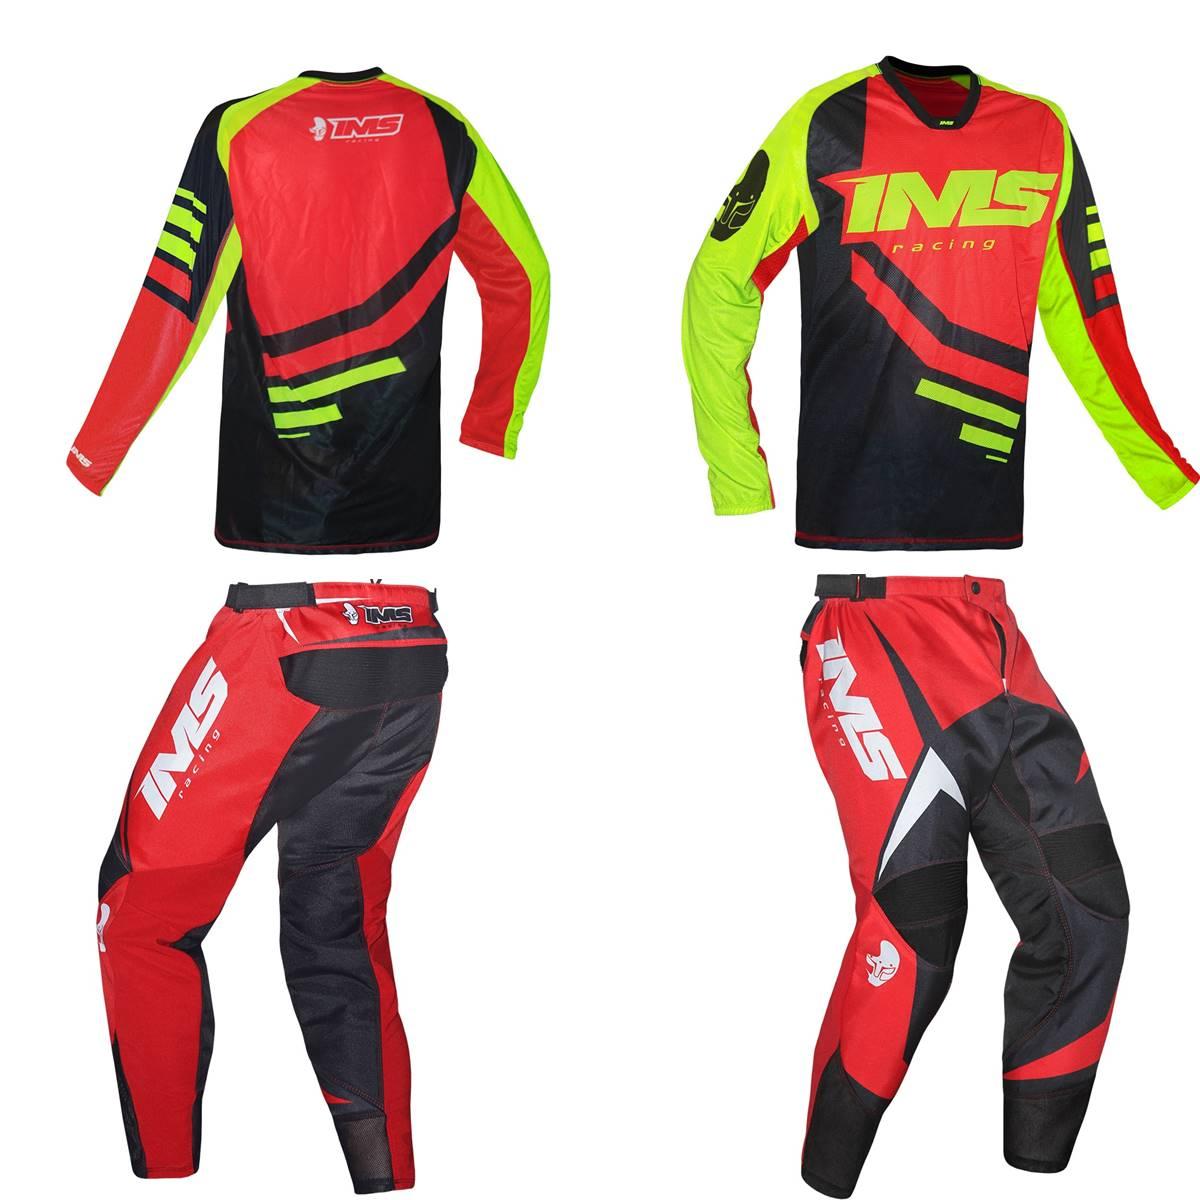 Kit Roupa Ims Camisa Sprint Calça Flex Preto Flúor Vermelho Motocross Trilha